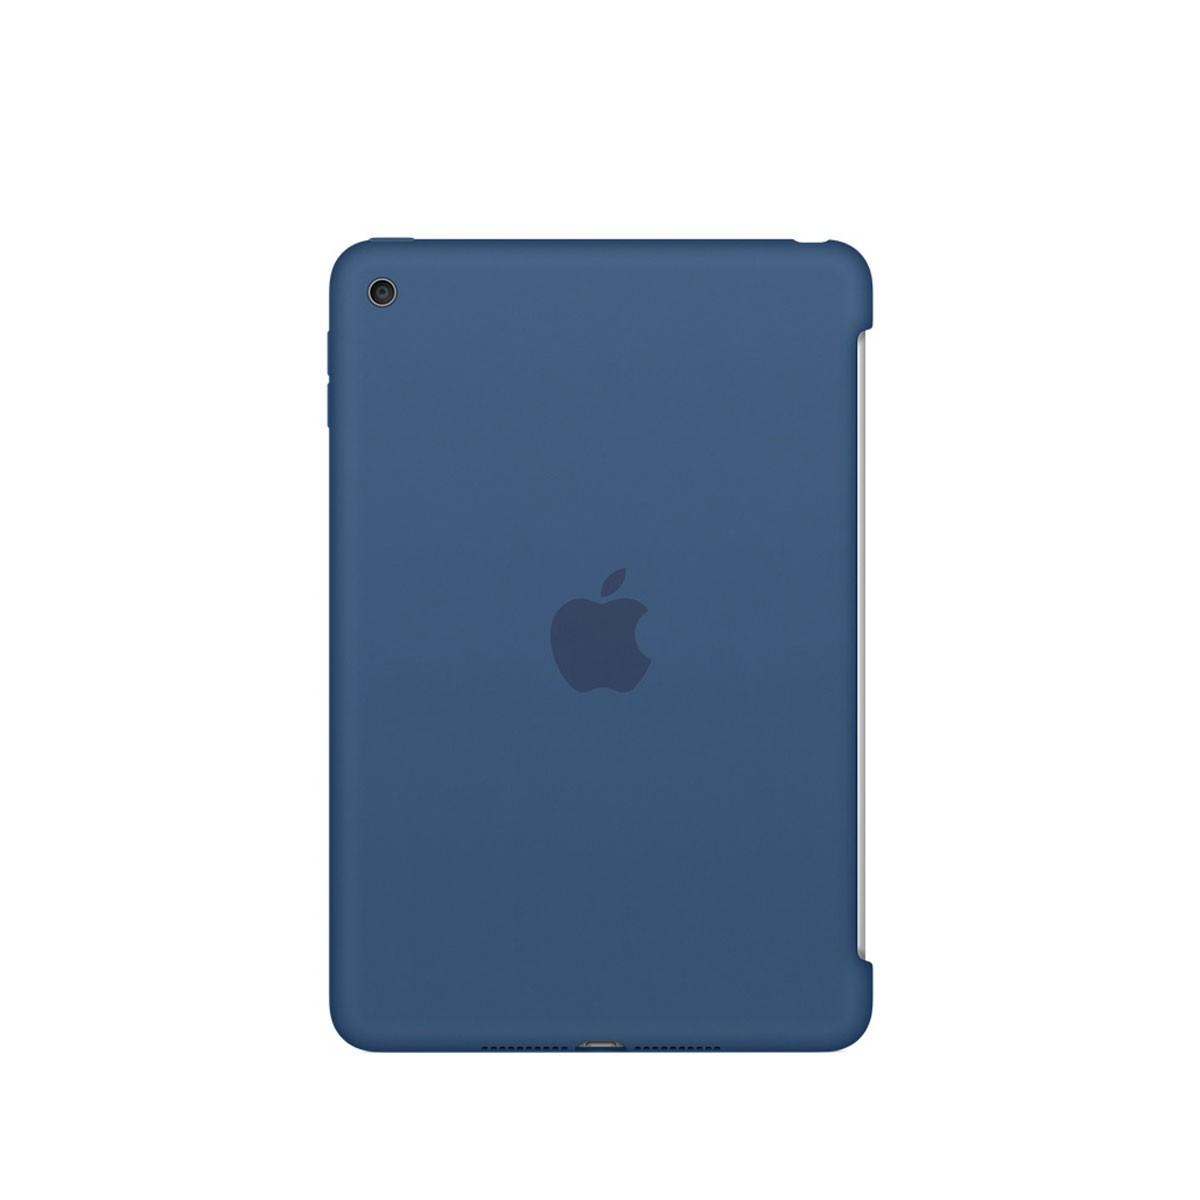 Apple Silikonové pouzdro na iPad mini 4 – mořsky modré